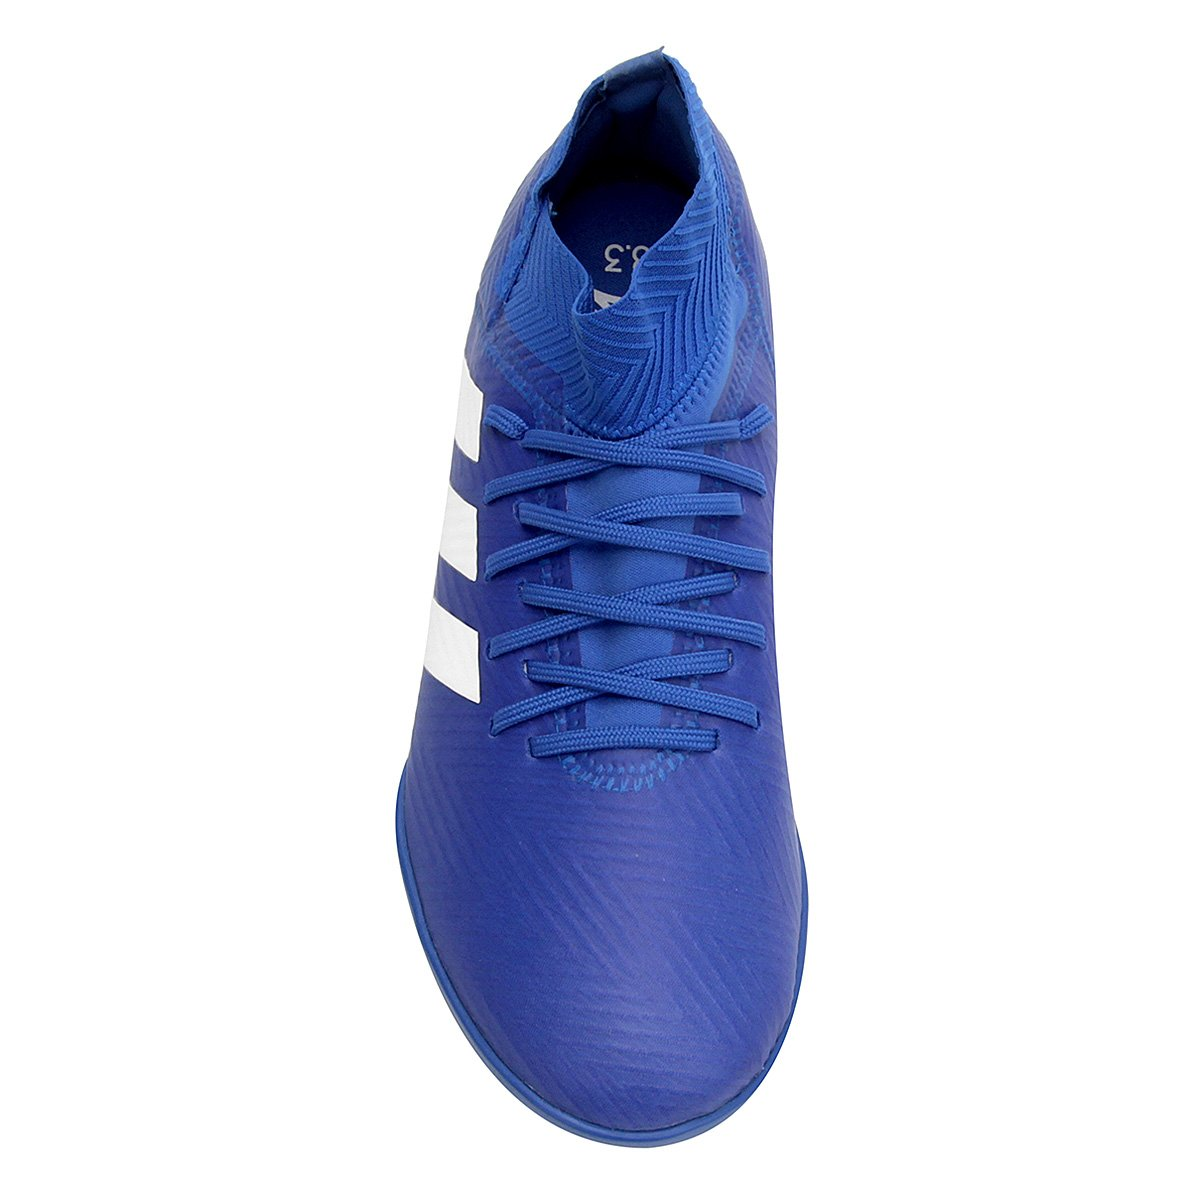 887f237c72 Chuteira Society Infantil Adidas Nemeziz Tango 18 3 TF - Azul e ...